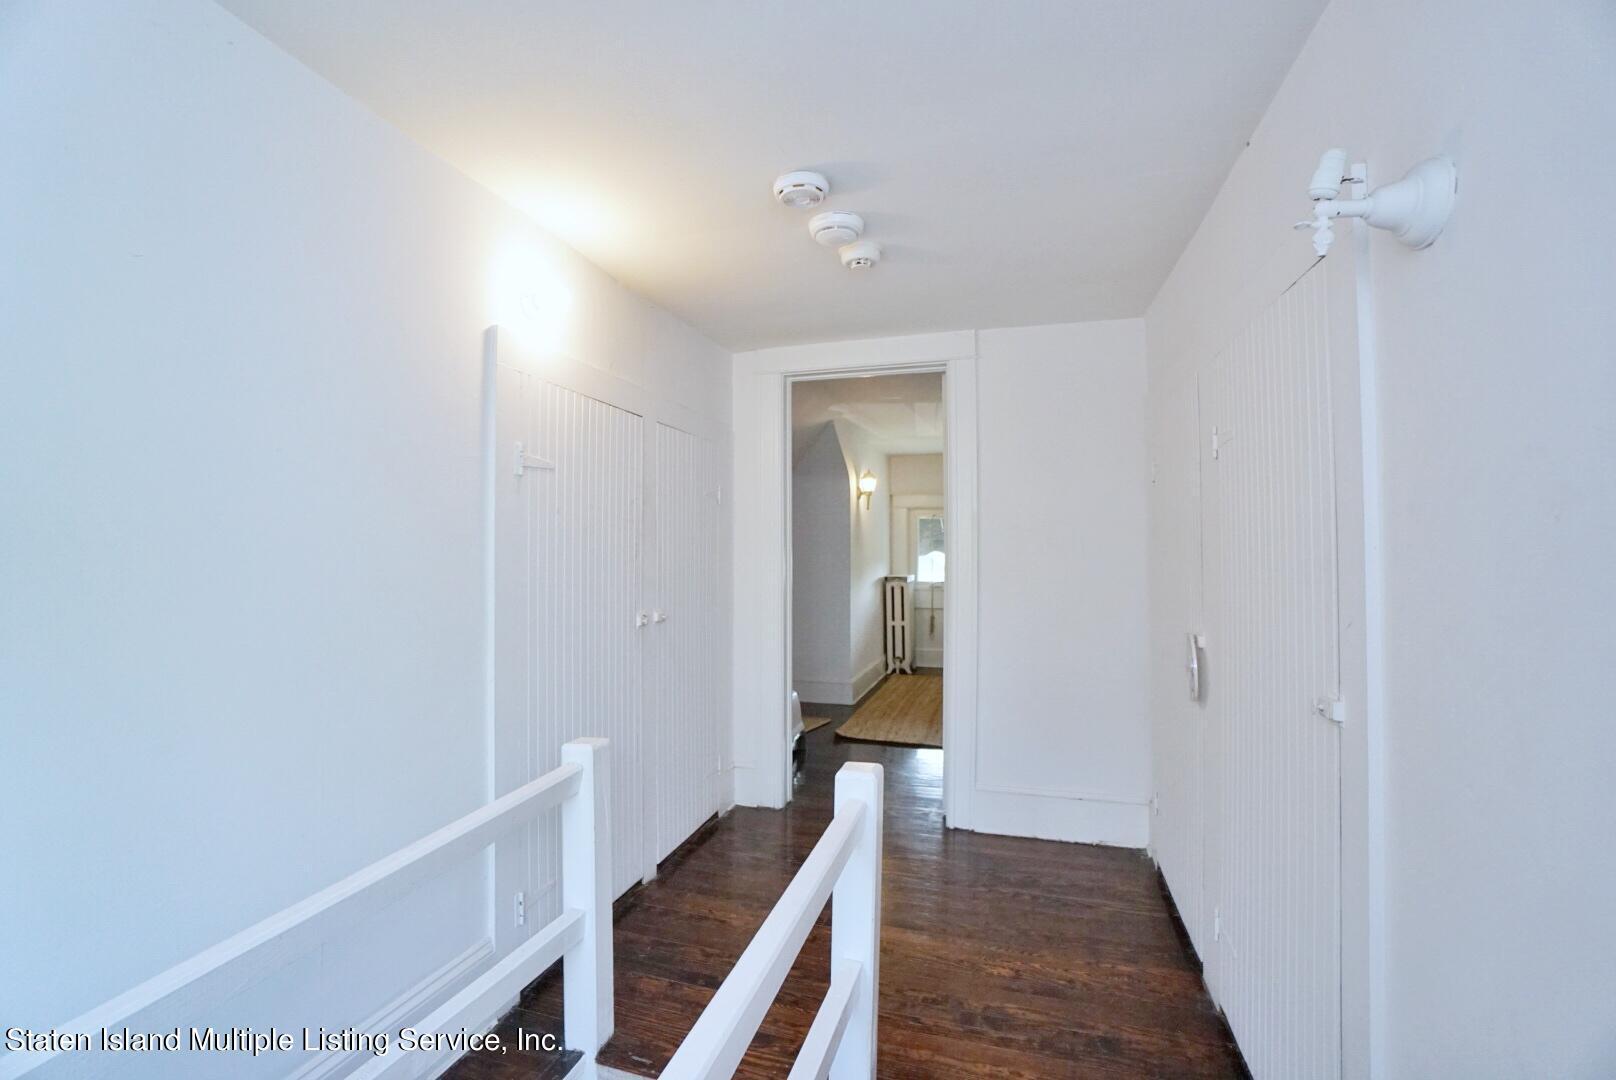 Single Family - Detached 311 Bement Avenue  Staten Island, NY 10310, MLS-1147133-31